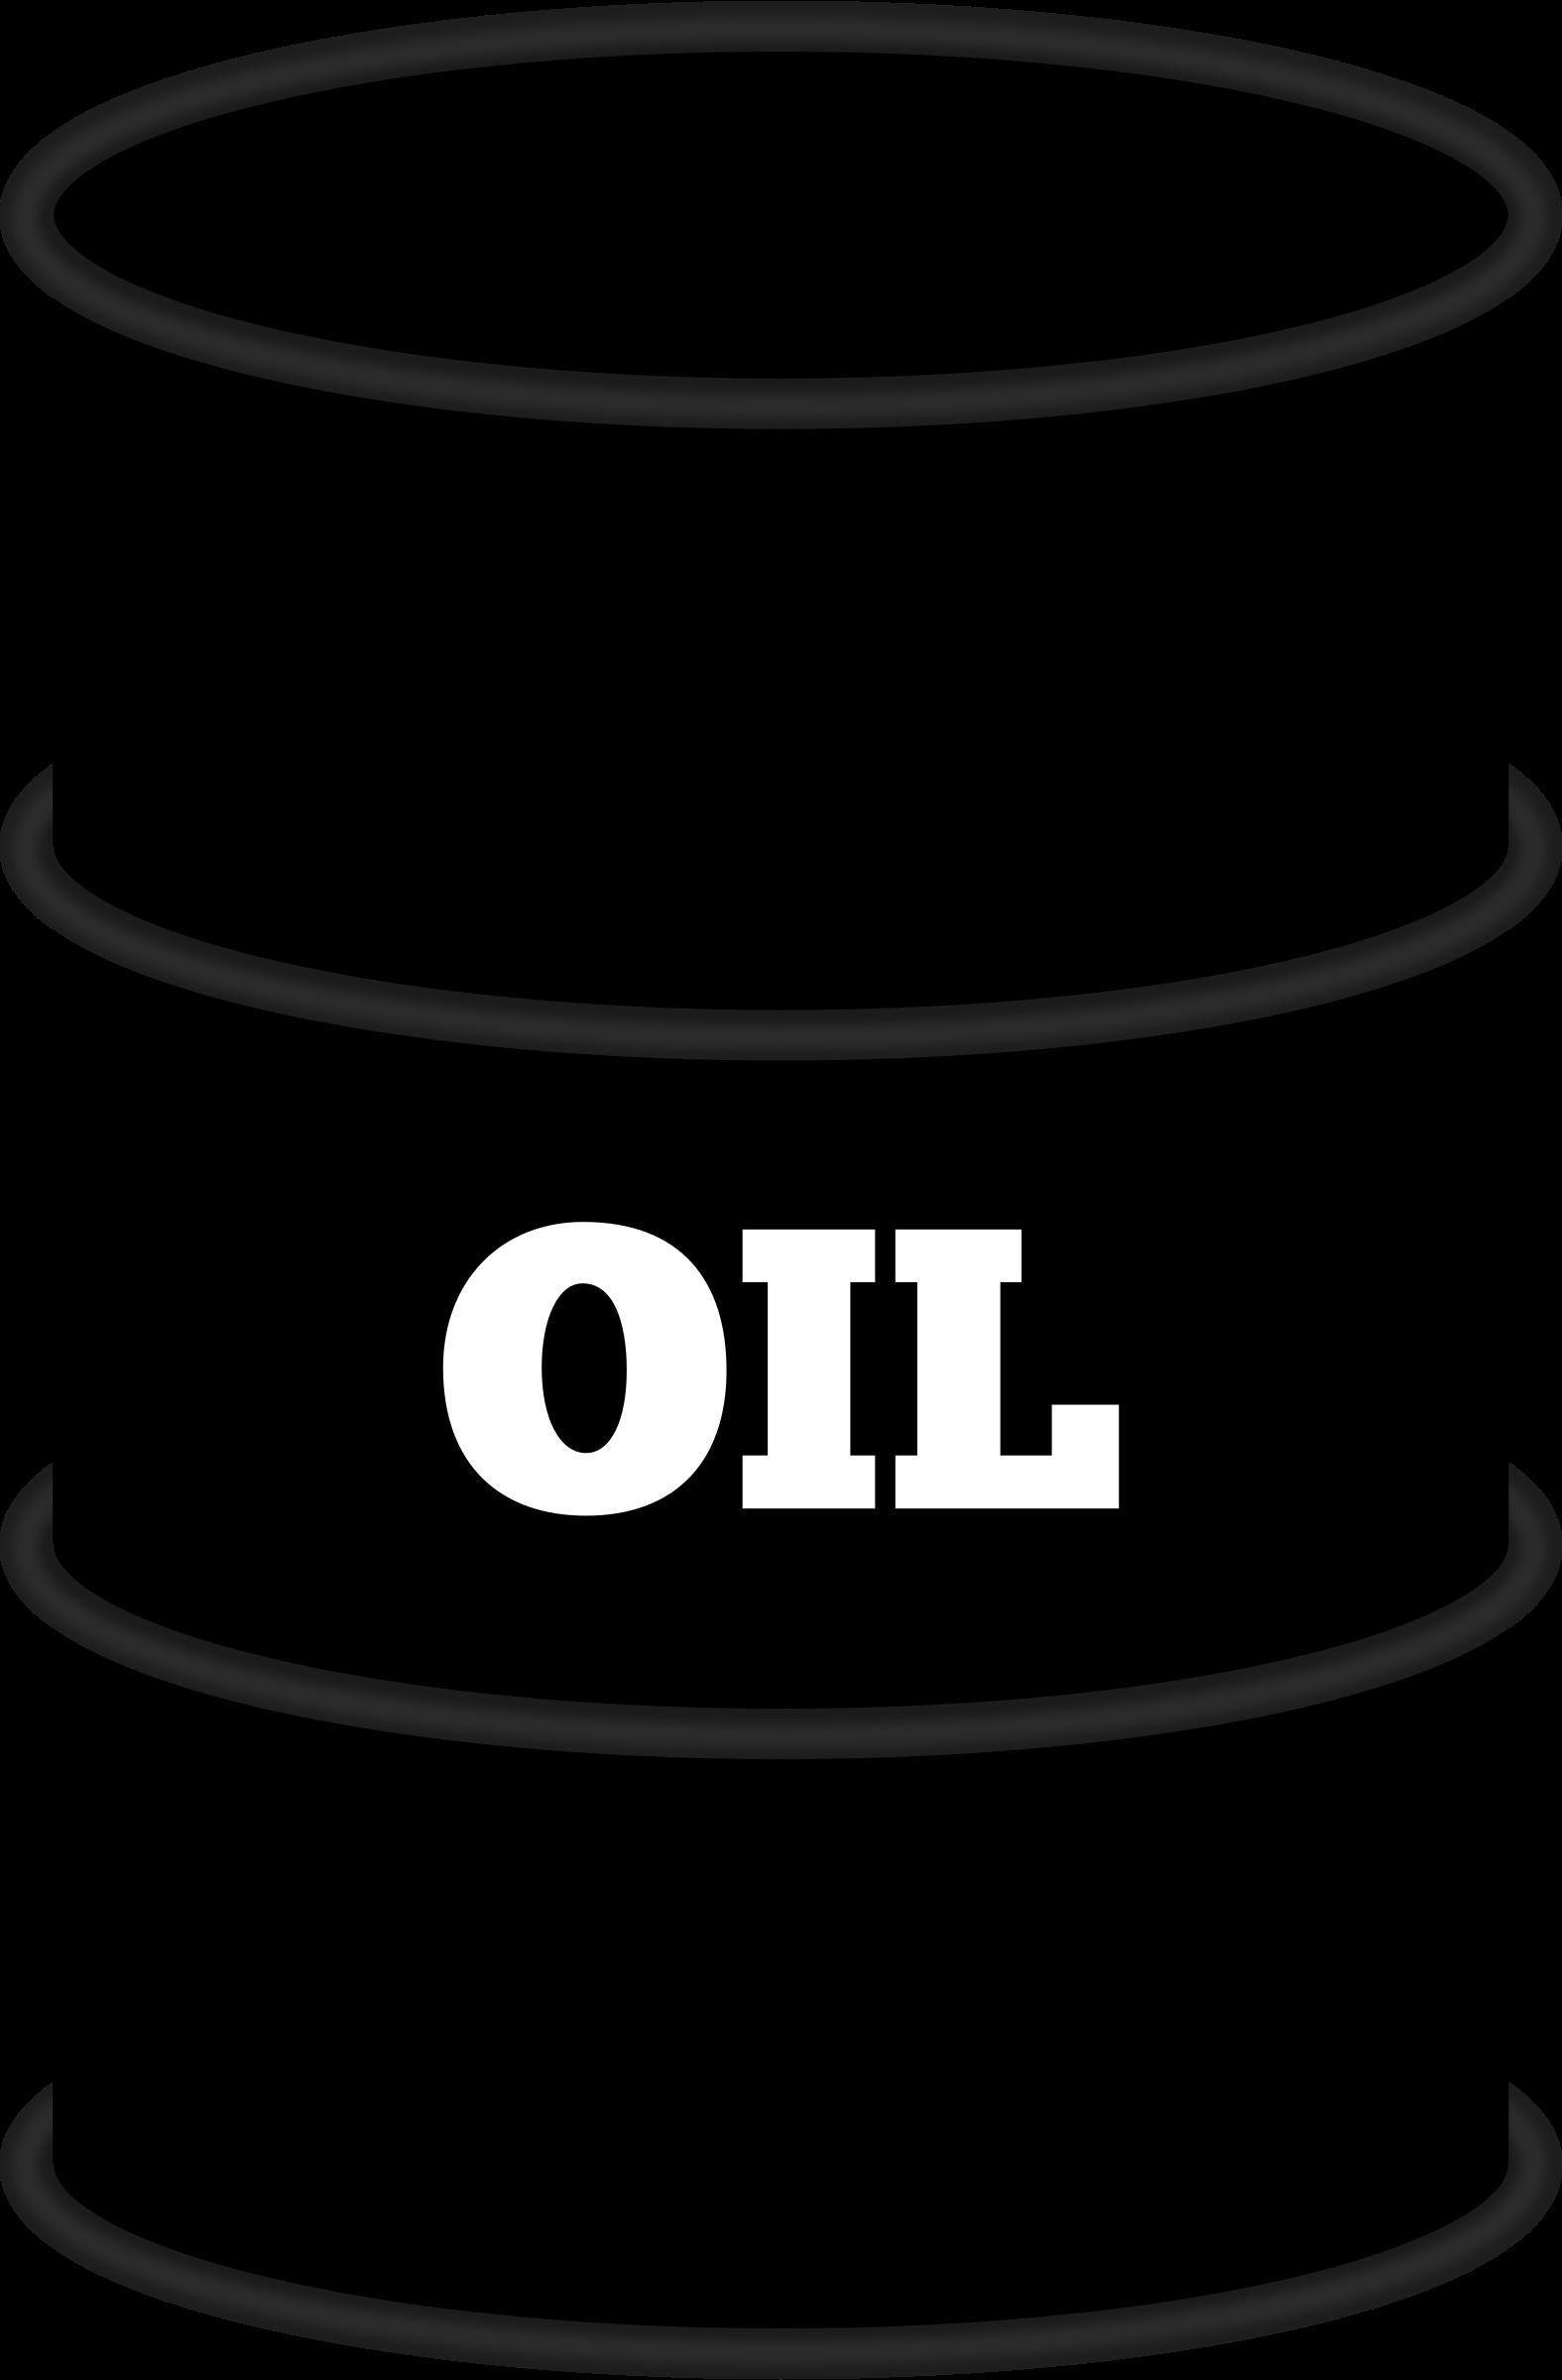 Clip Art Oil Can Clipart - Clipart Suggest